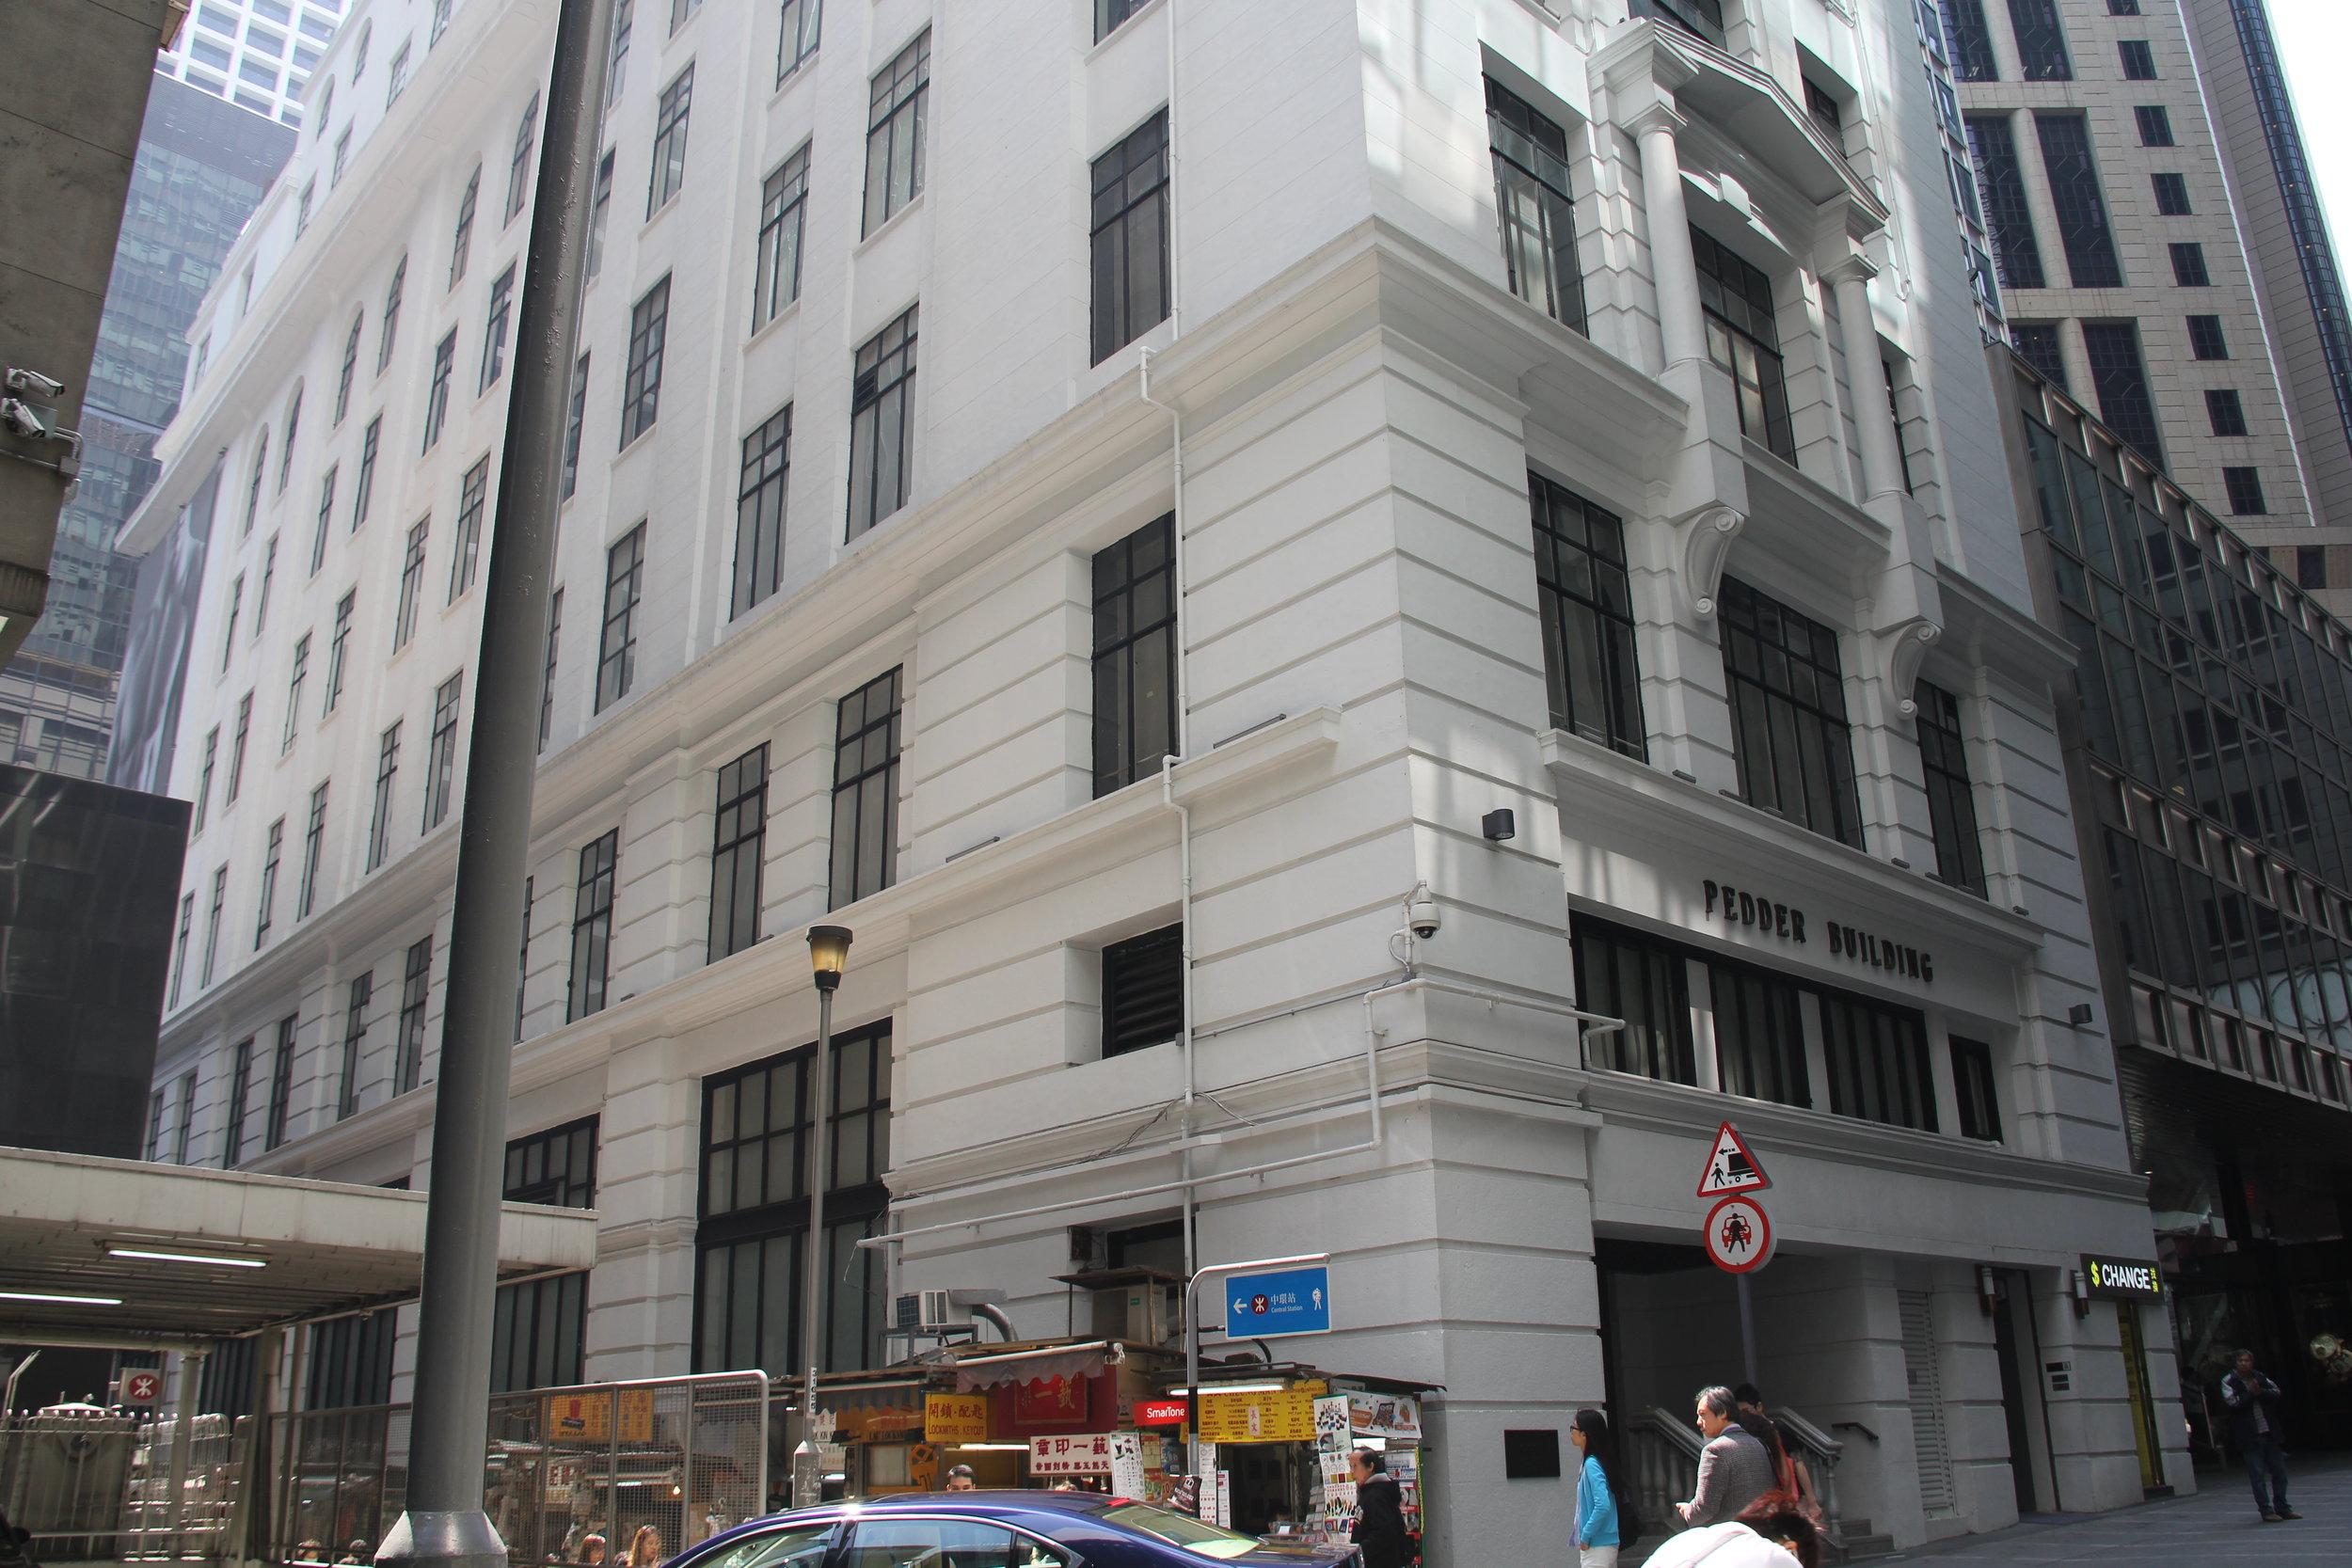 IMG_0842 Pedder Building HK.JPG